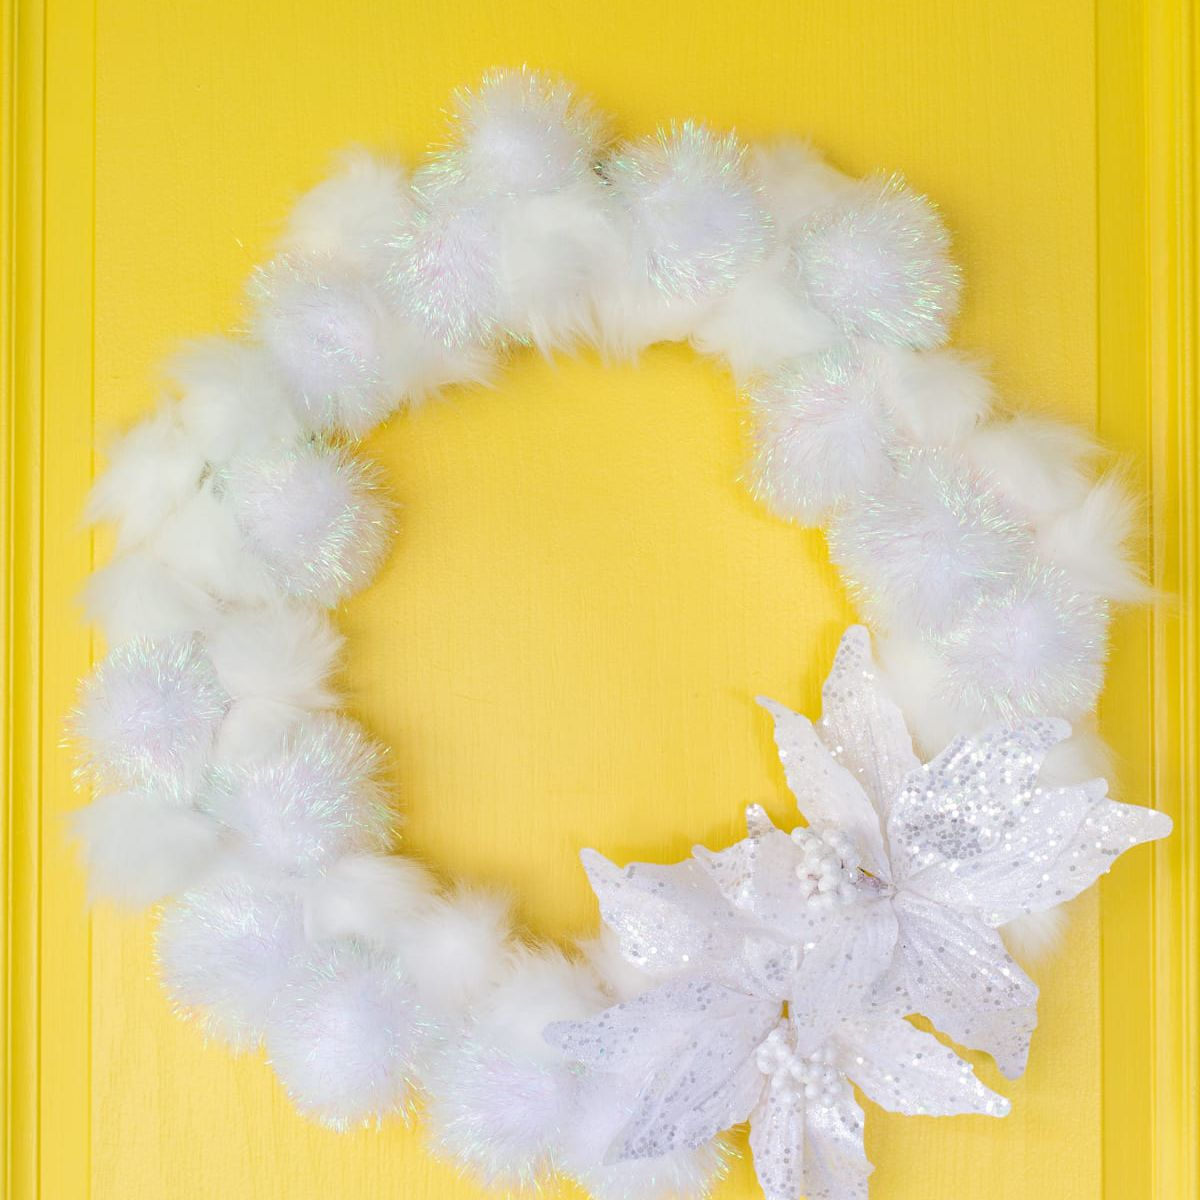 Iridescent Wreath